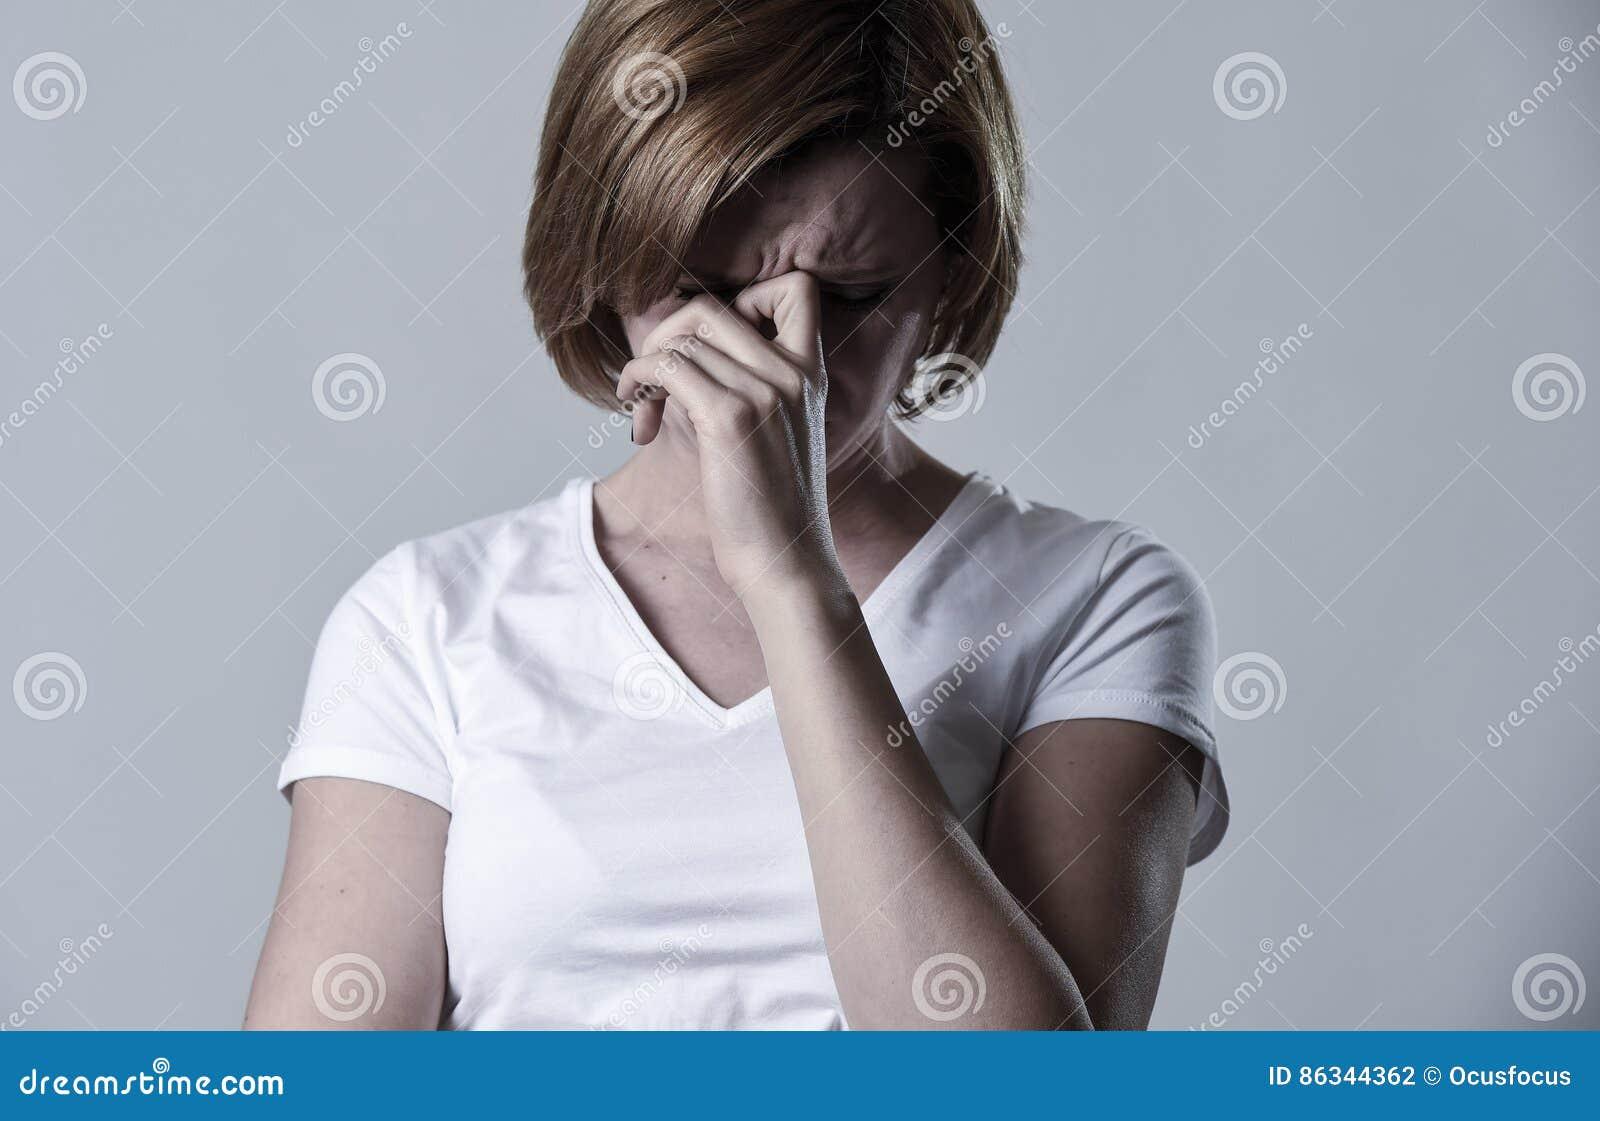 Devastated depressed woman crying sad feeling hurt suffering depression in sadness emotion